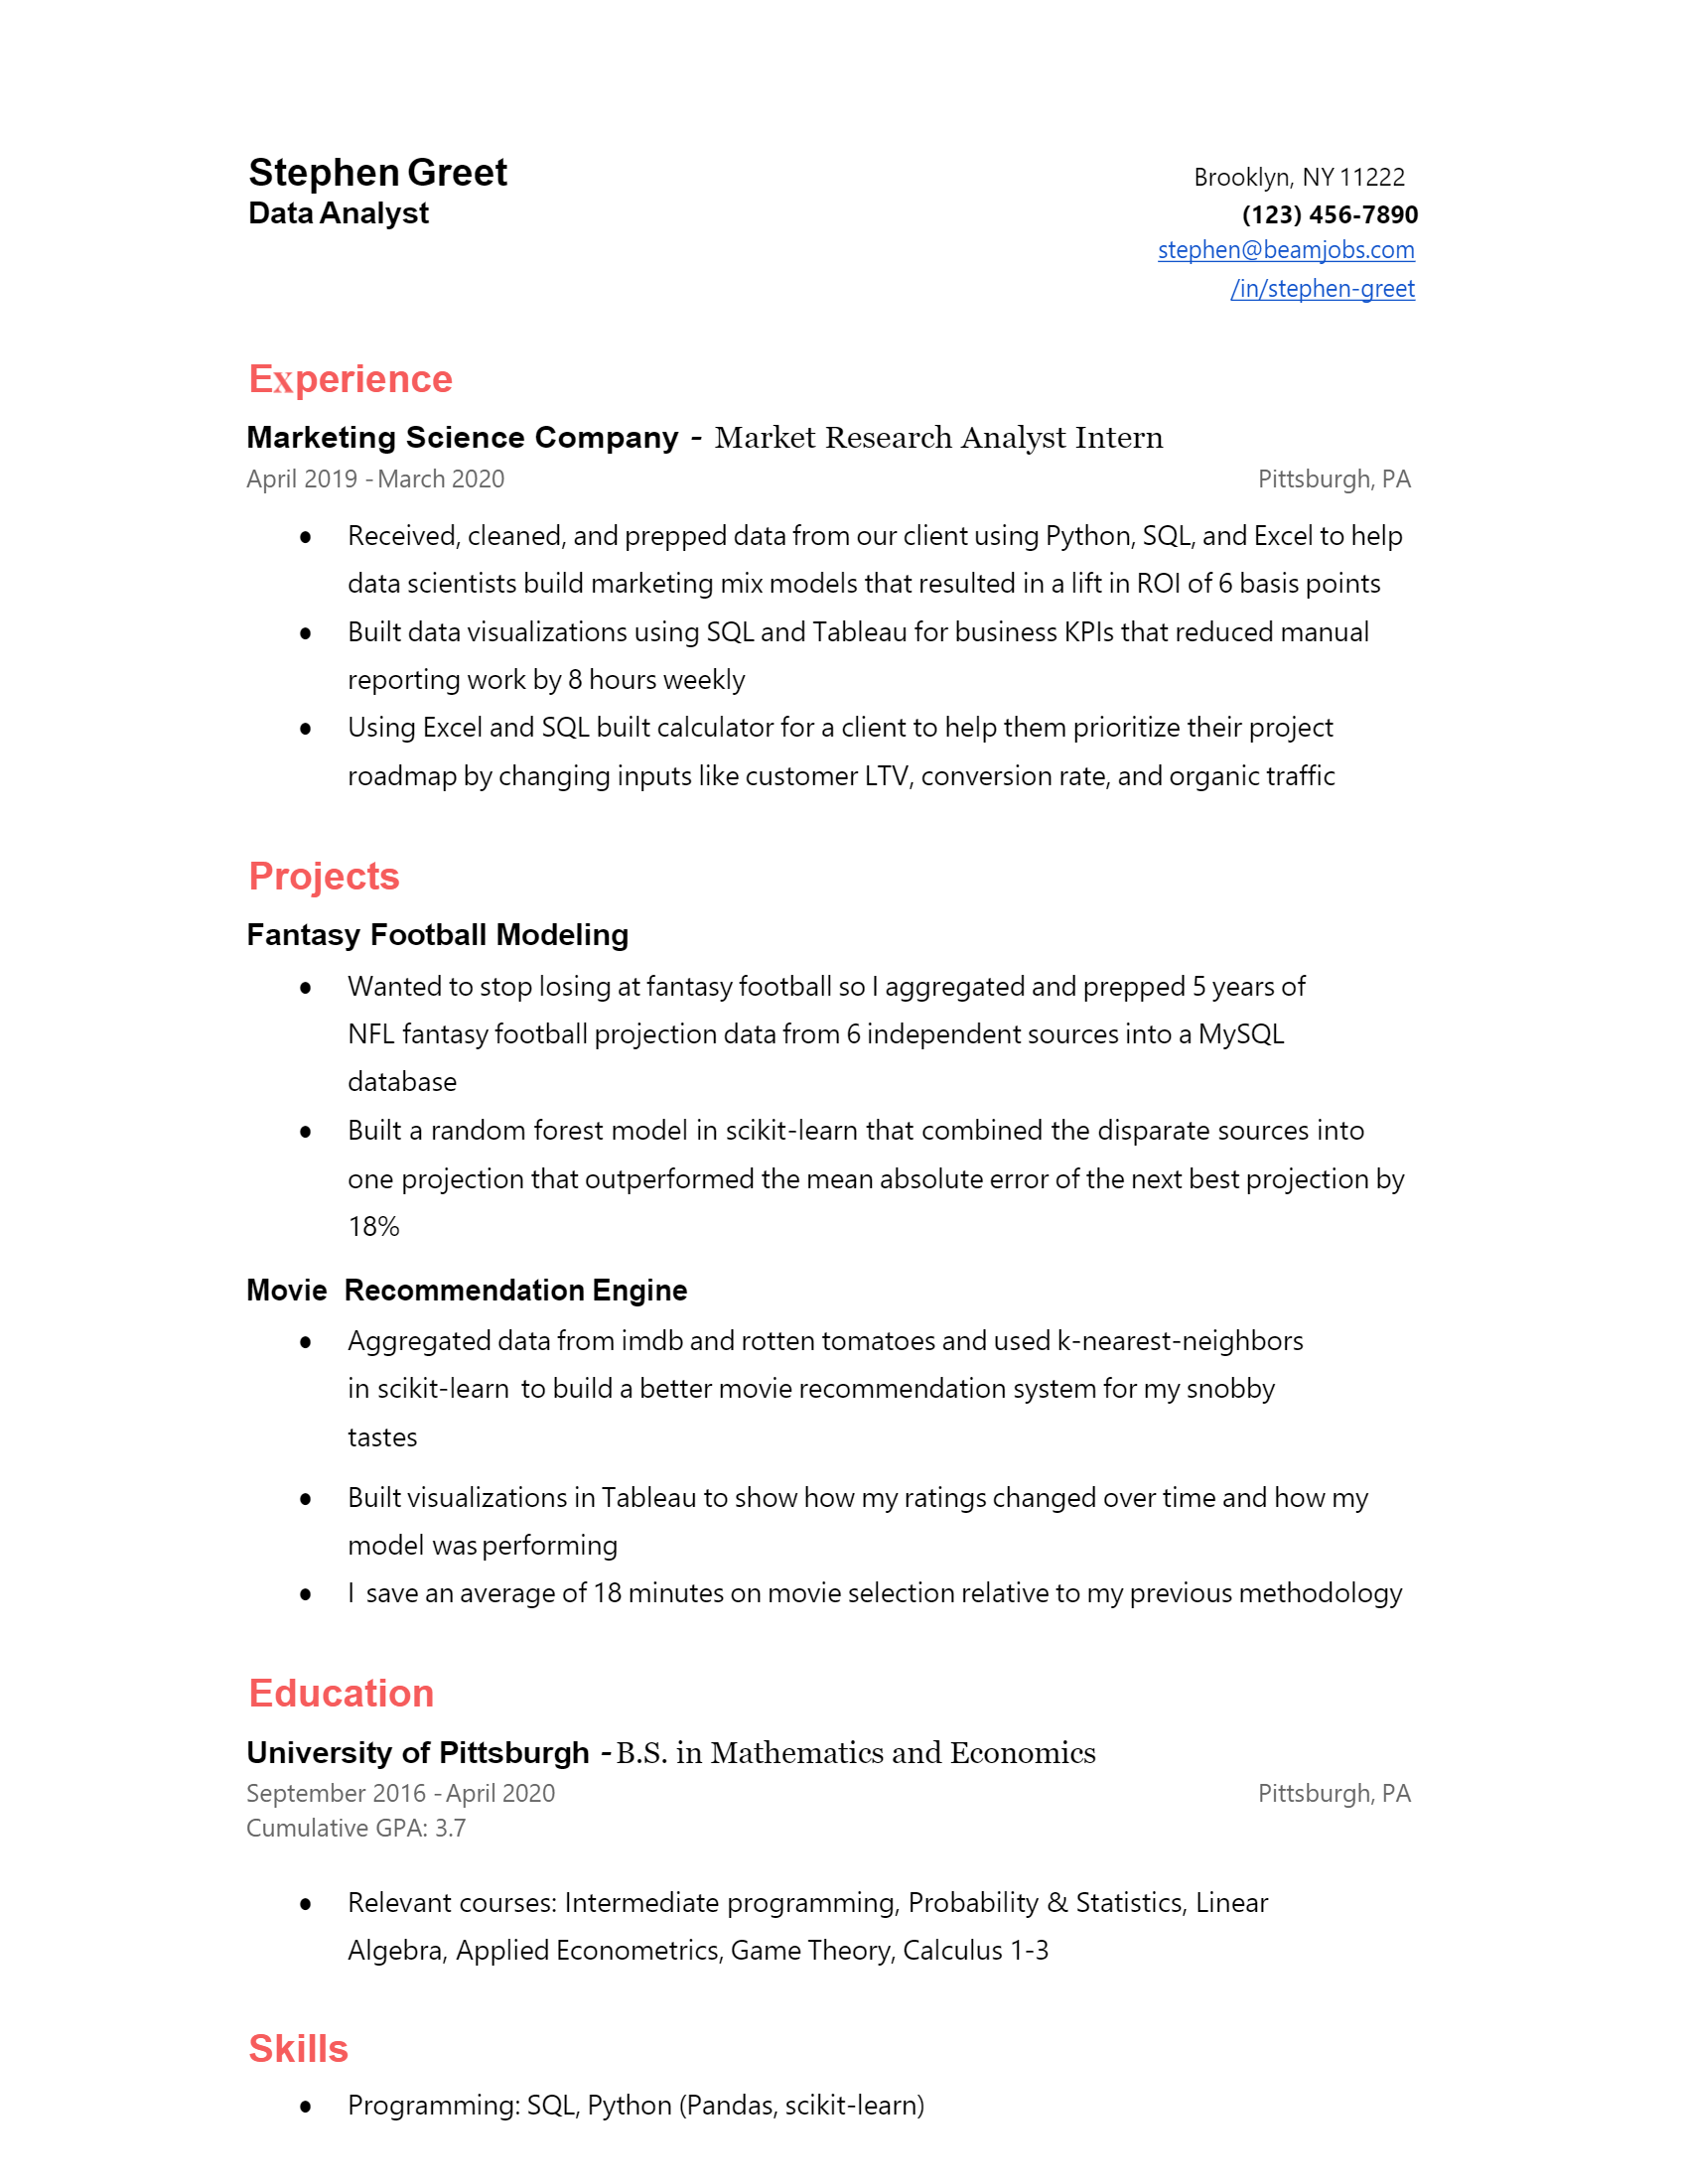 Entry Level Data Analyst Resume .Docx (Word)